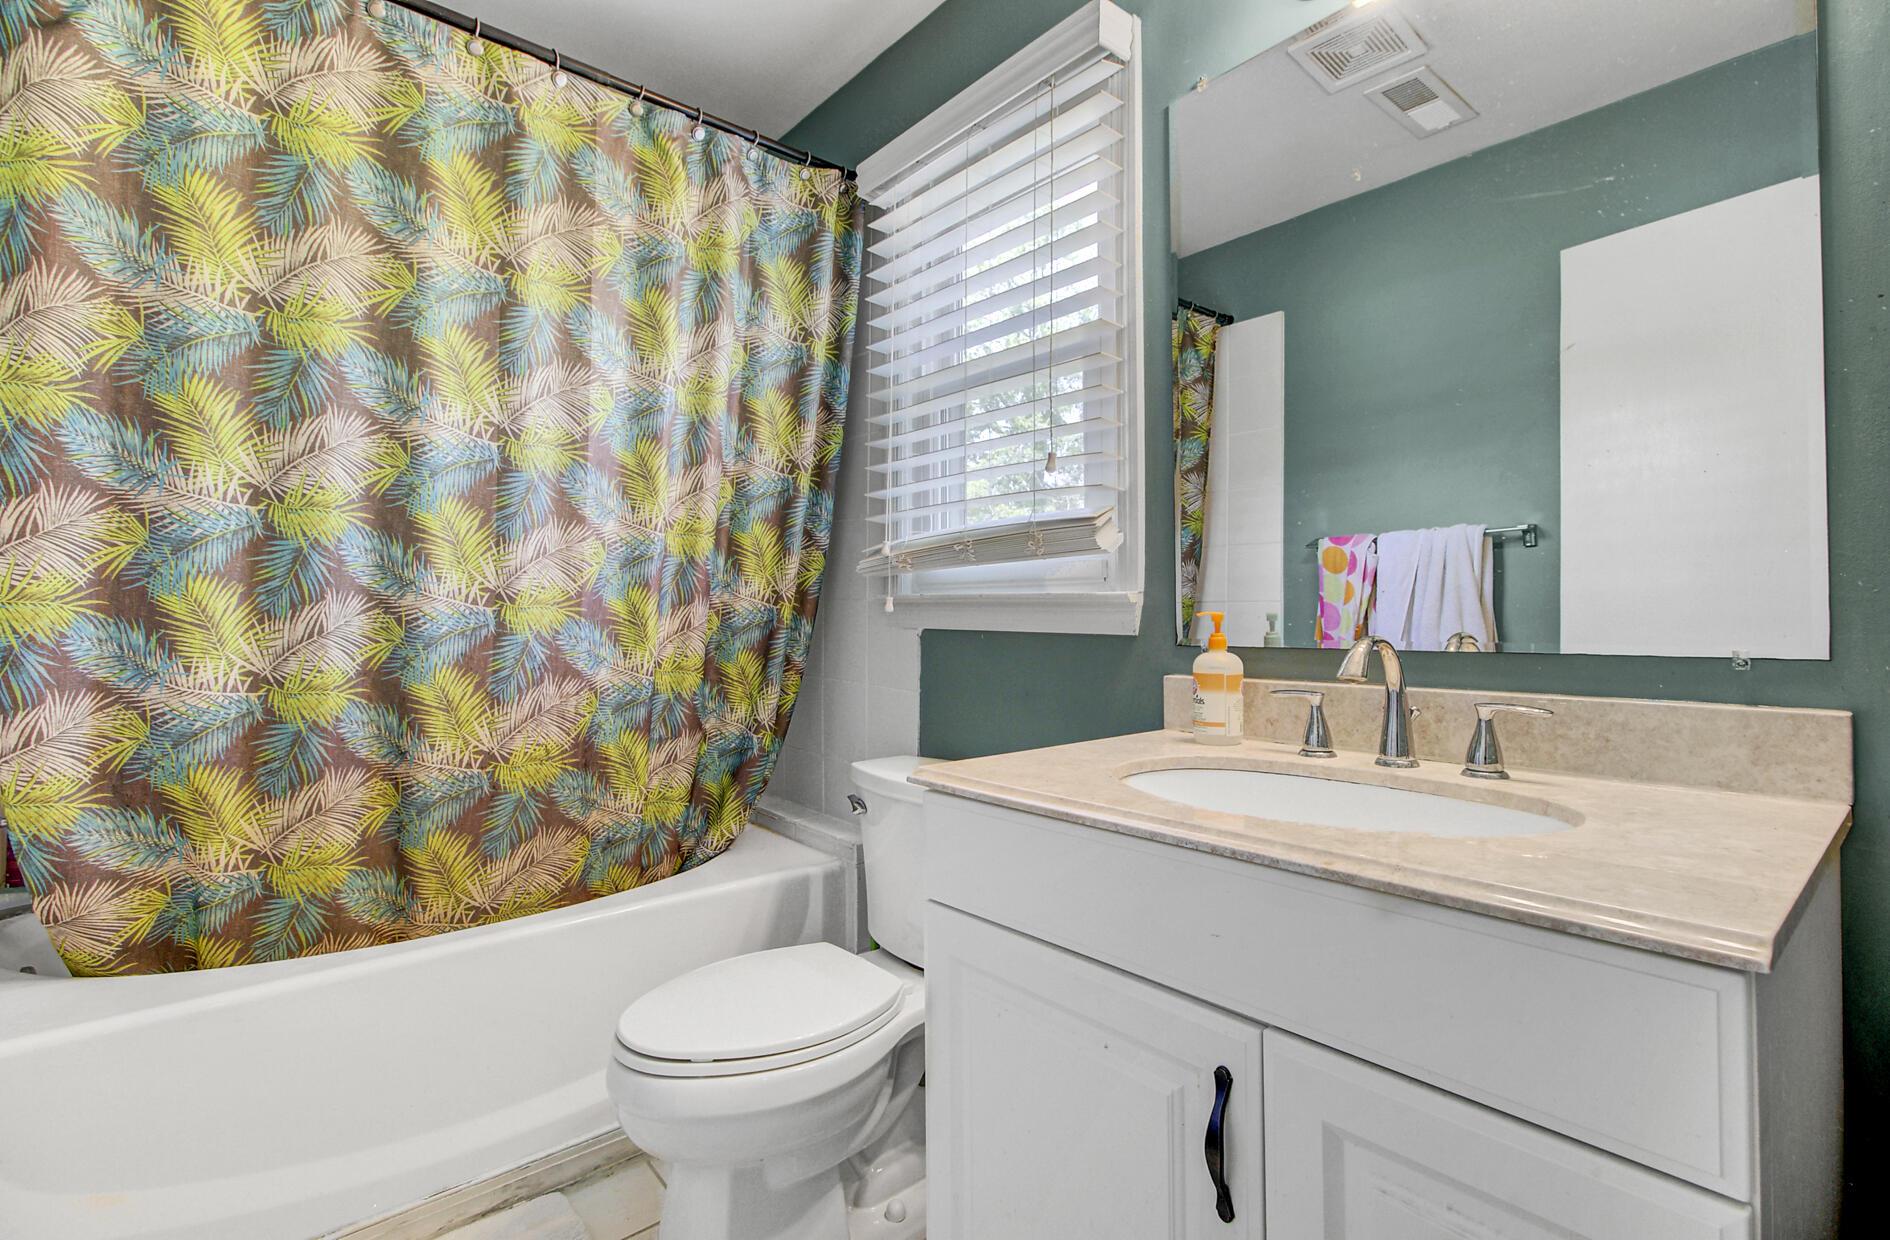 Yaugh Hall Homes For Sale - 1229 Porchers Bluff, Mount Pleasant, SC - 3